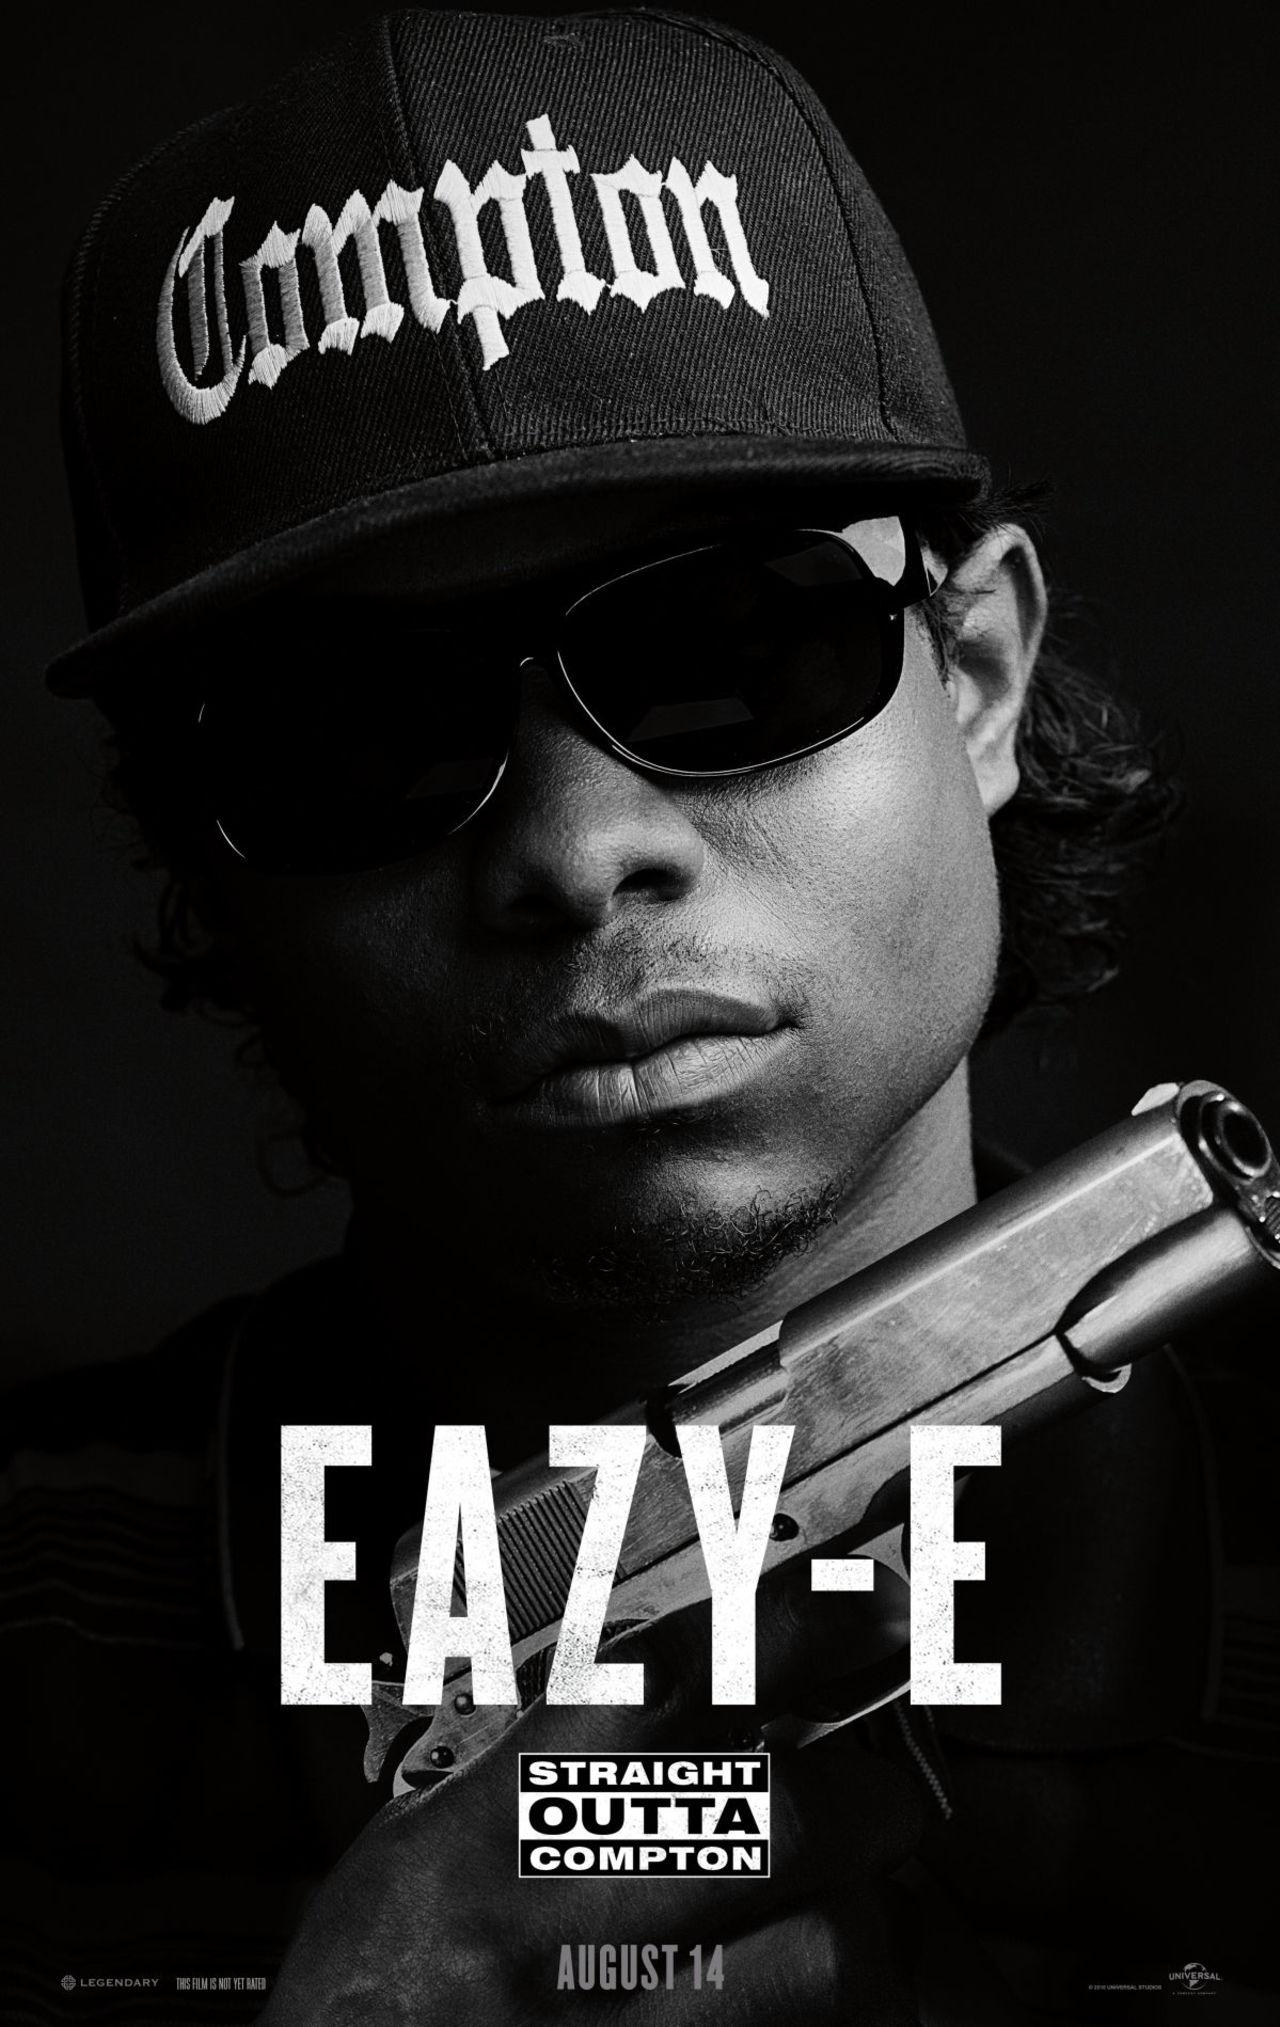 Jason Mitchell as Eazy-E